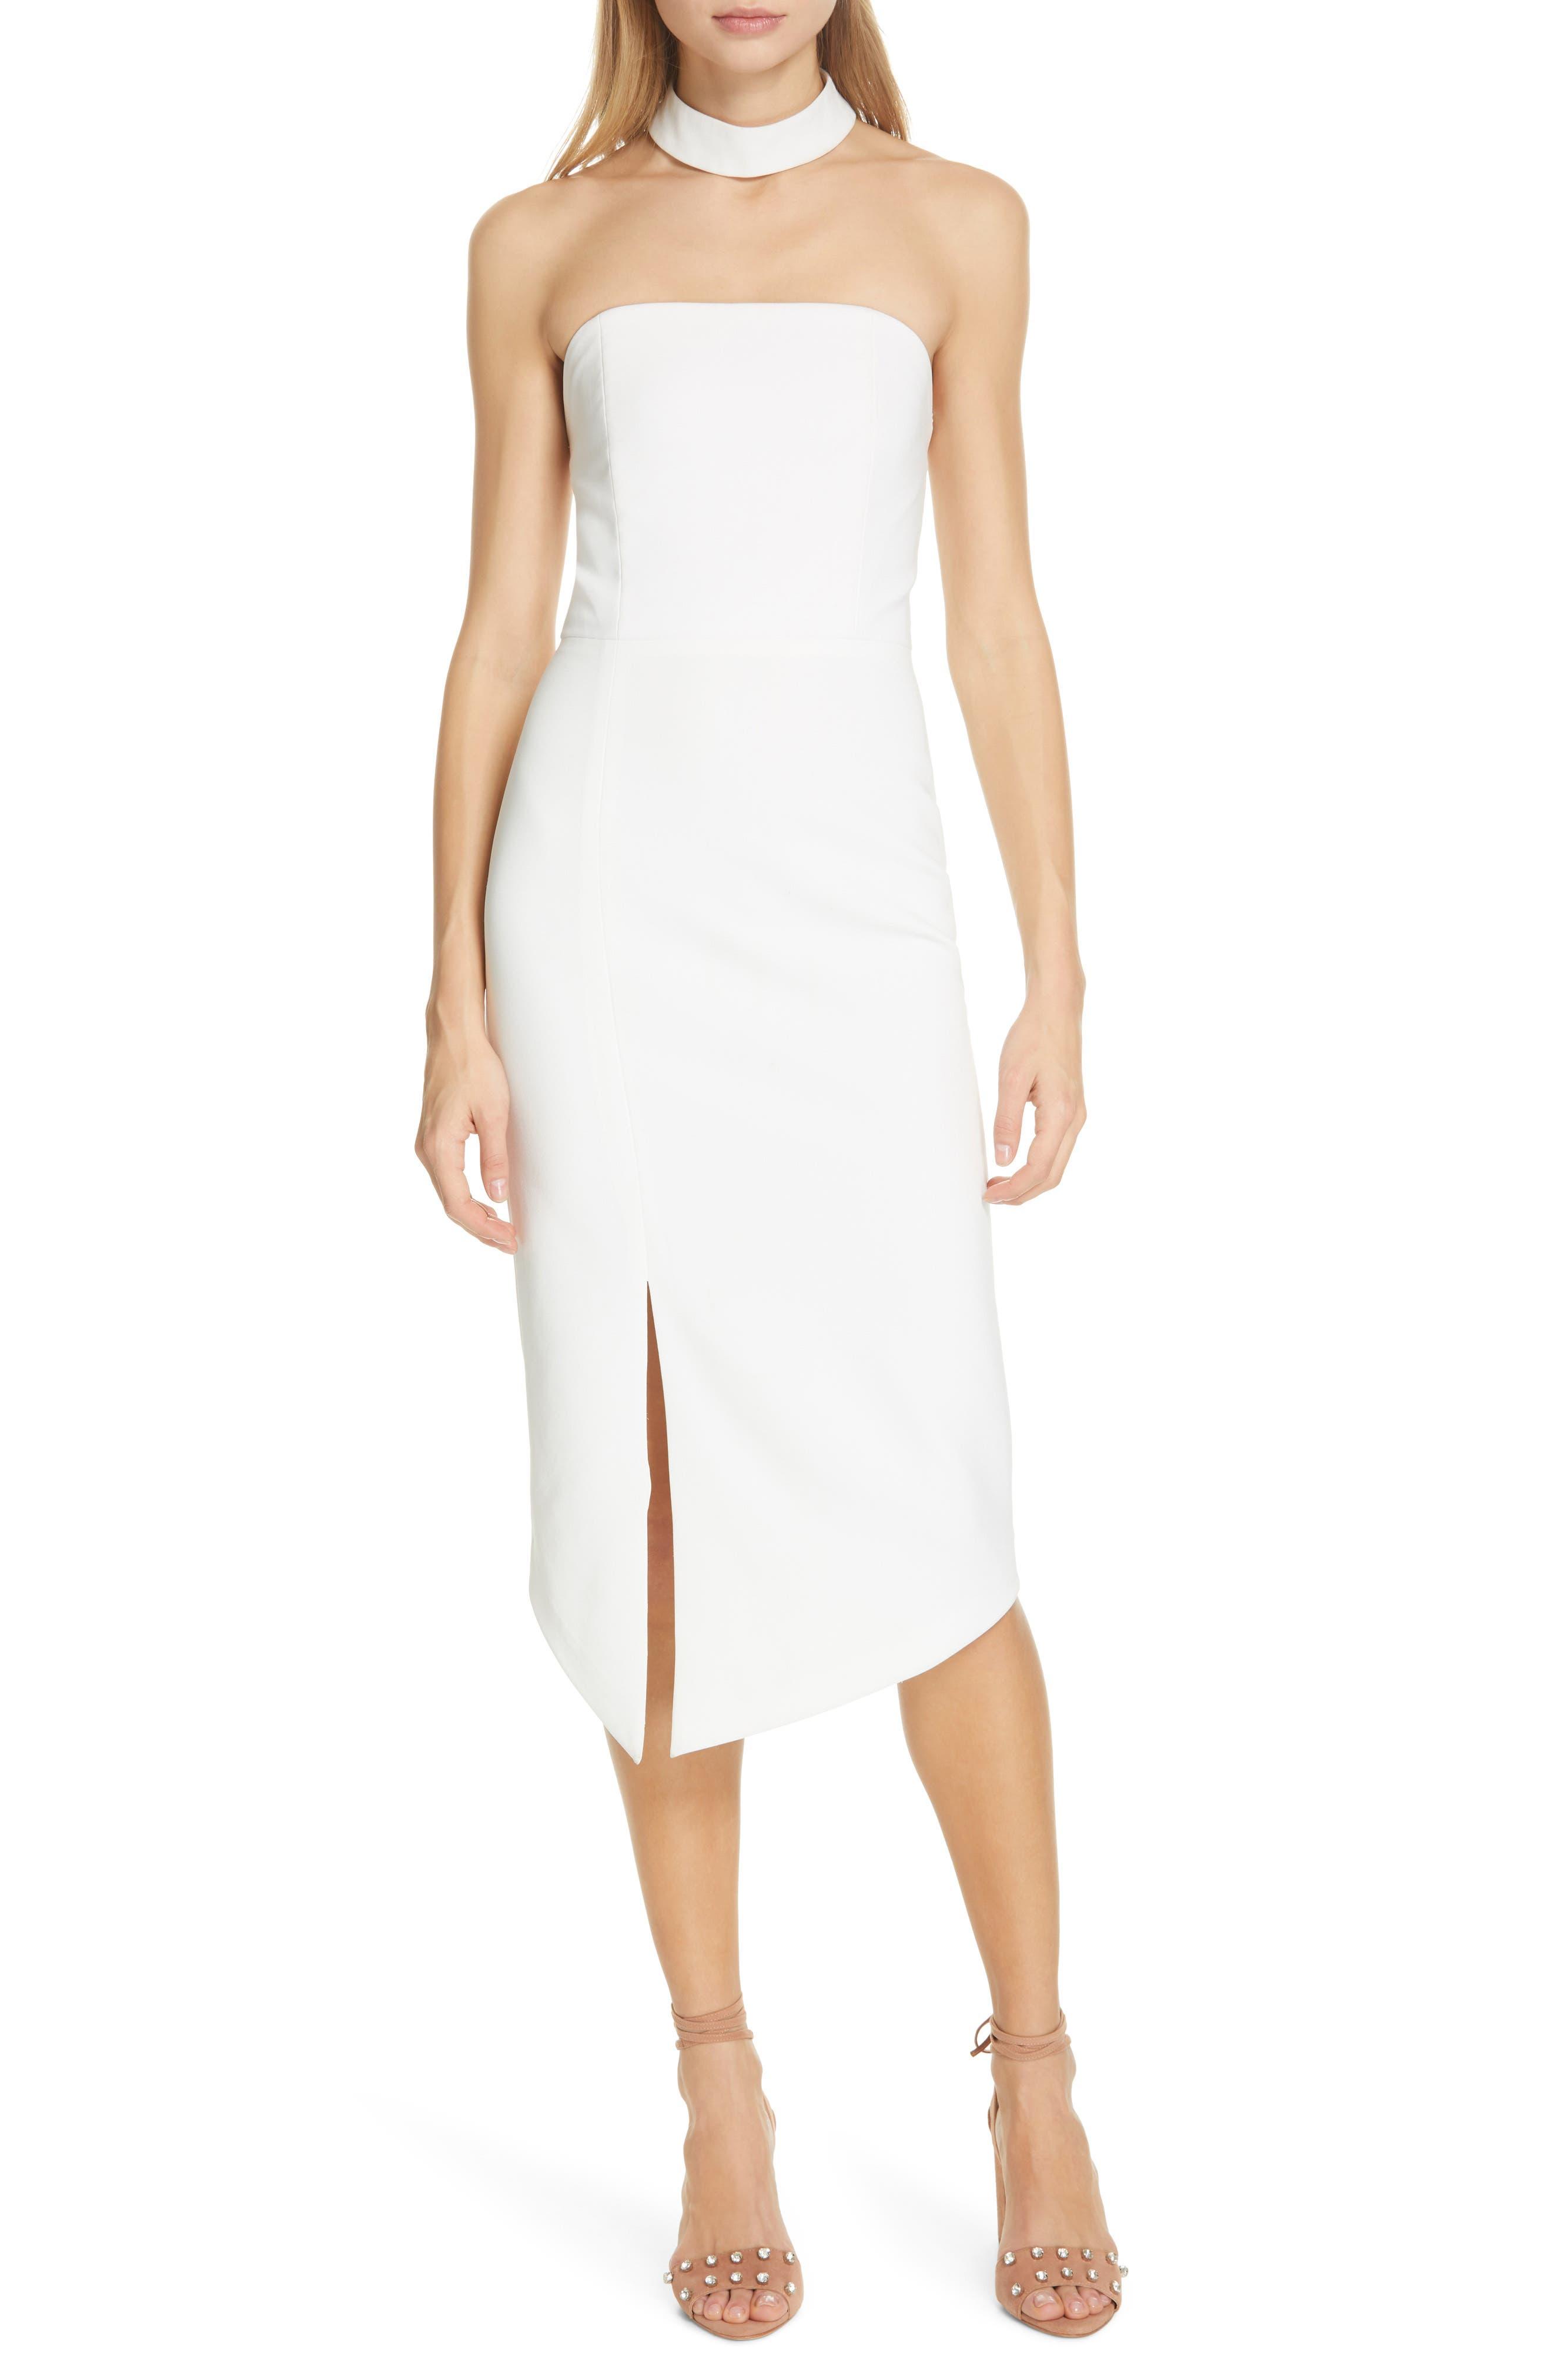 Alice + Olivia Sia Strapless Choker Collar Dress, Ivory